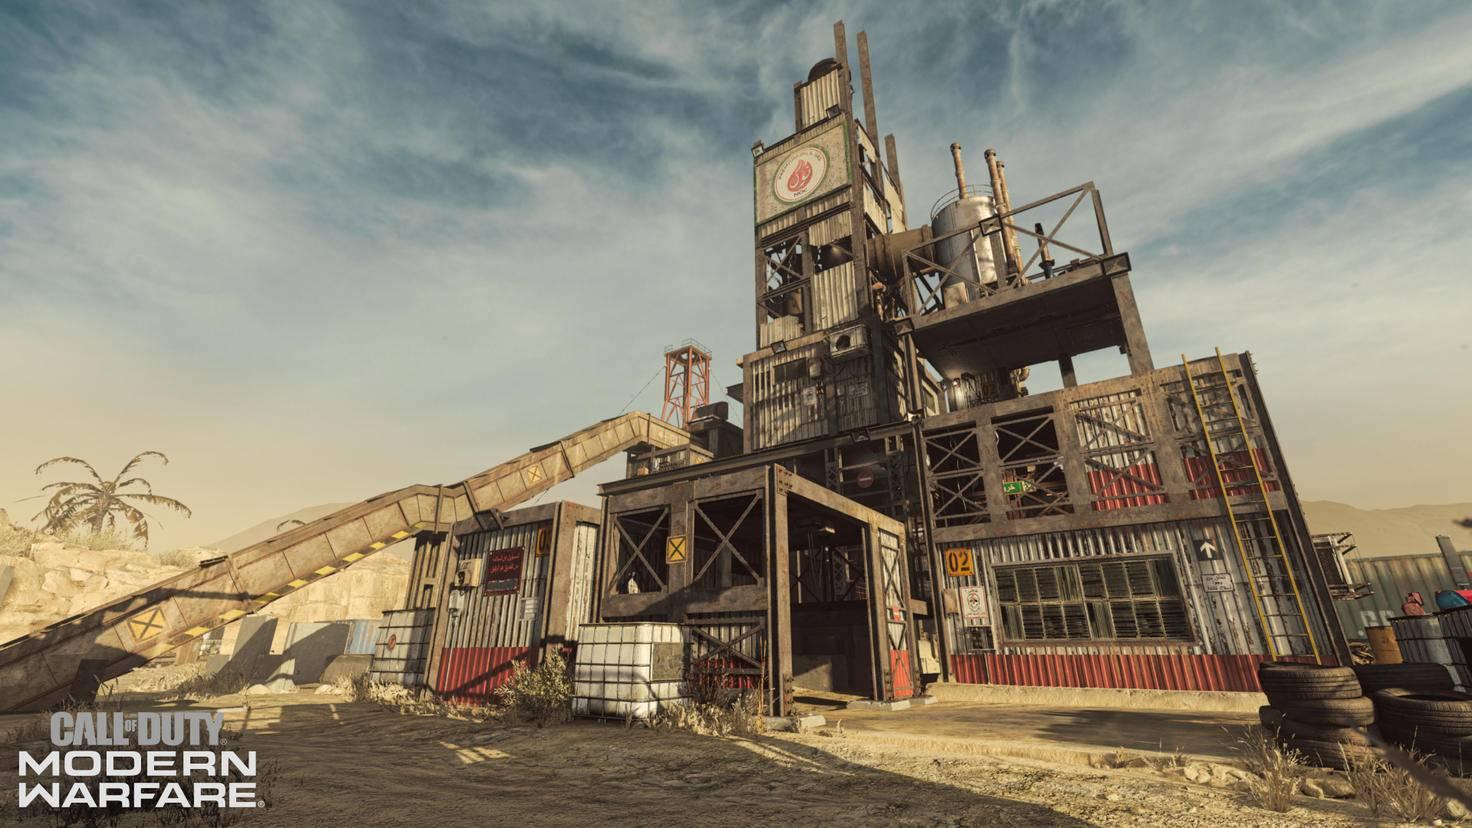 call-of-duty-modern-warfare-rust